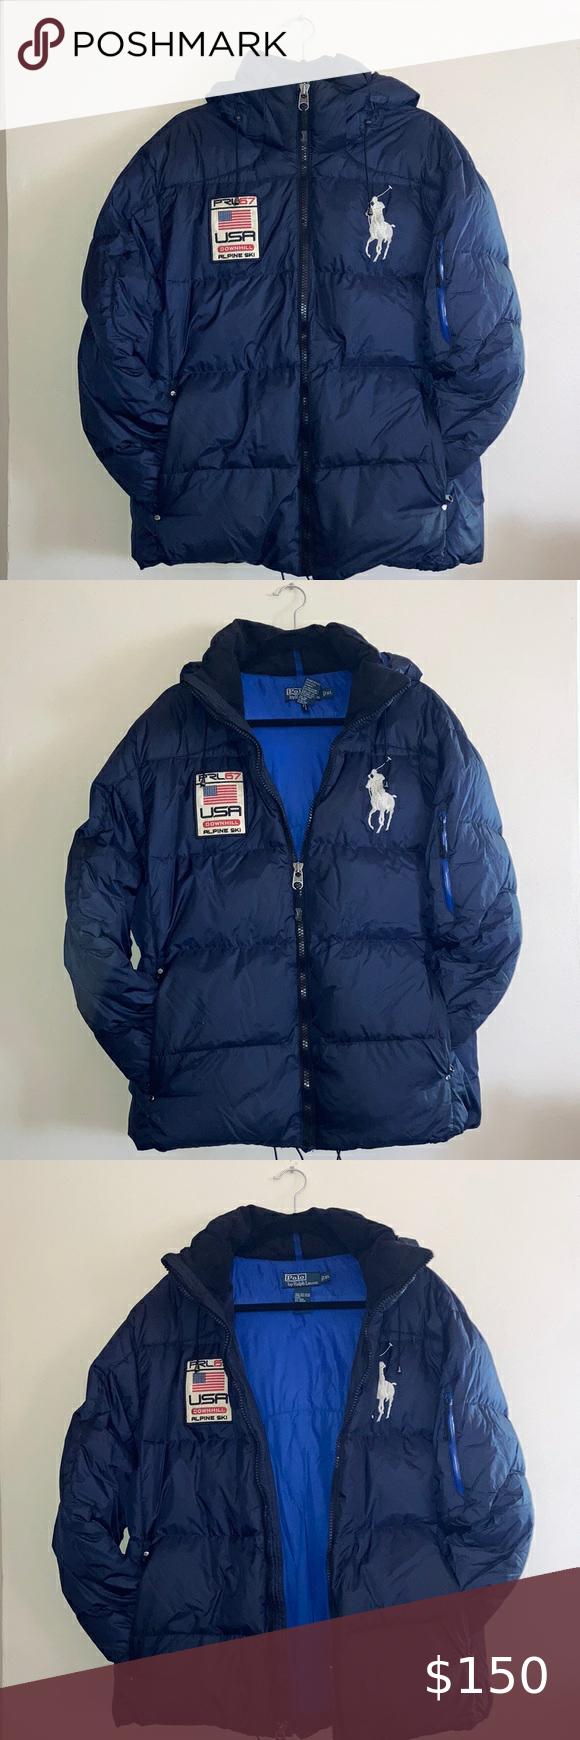 Polo By Ralph Lauren Winter Jacket Gently Worn Jacket Excellent For Winter Months Extremely Warm While Not Stylish Jackets Winter Jackets Polo Ralph Lauren [ 1740 x 580 Pixel ]